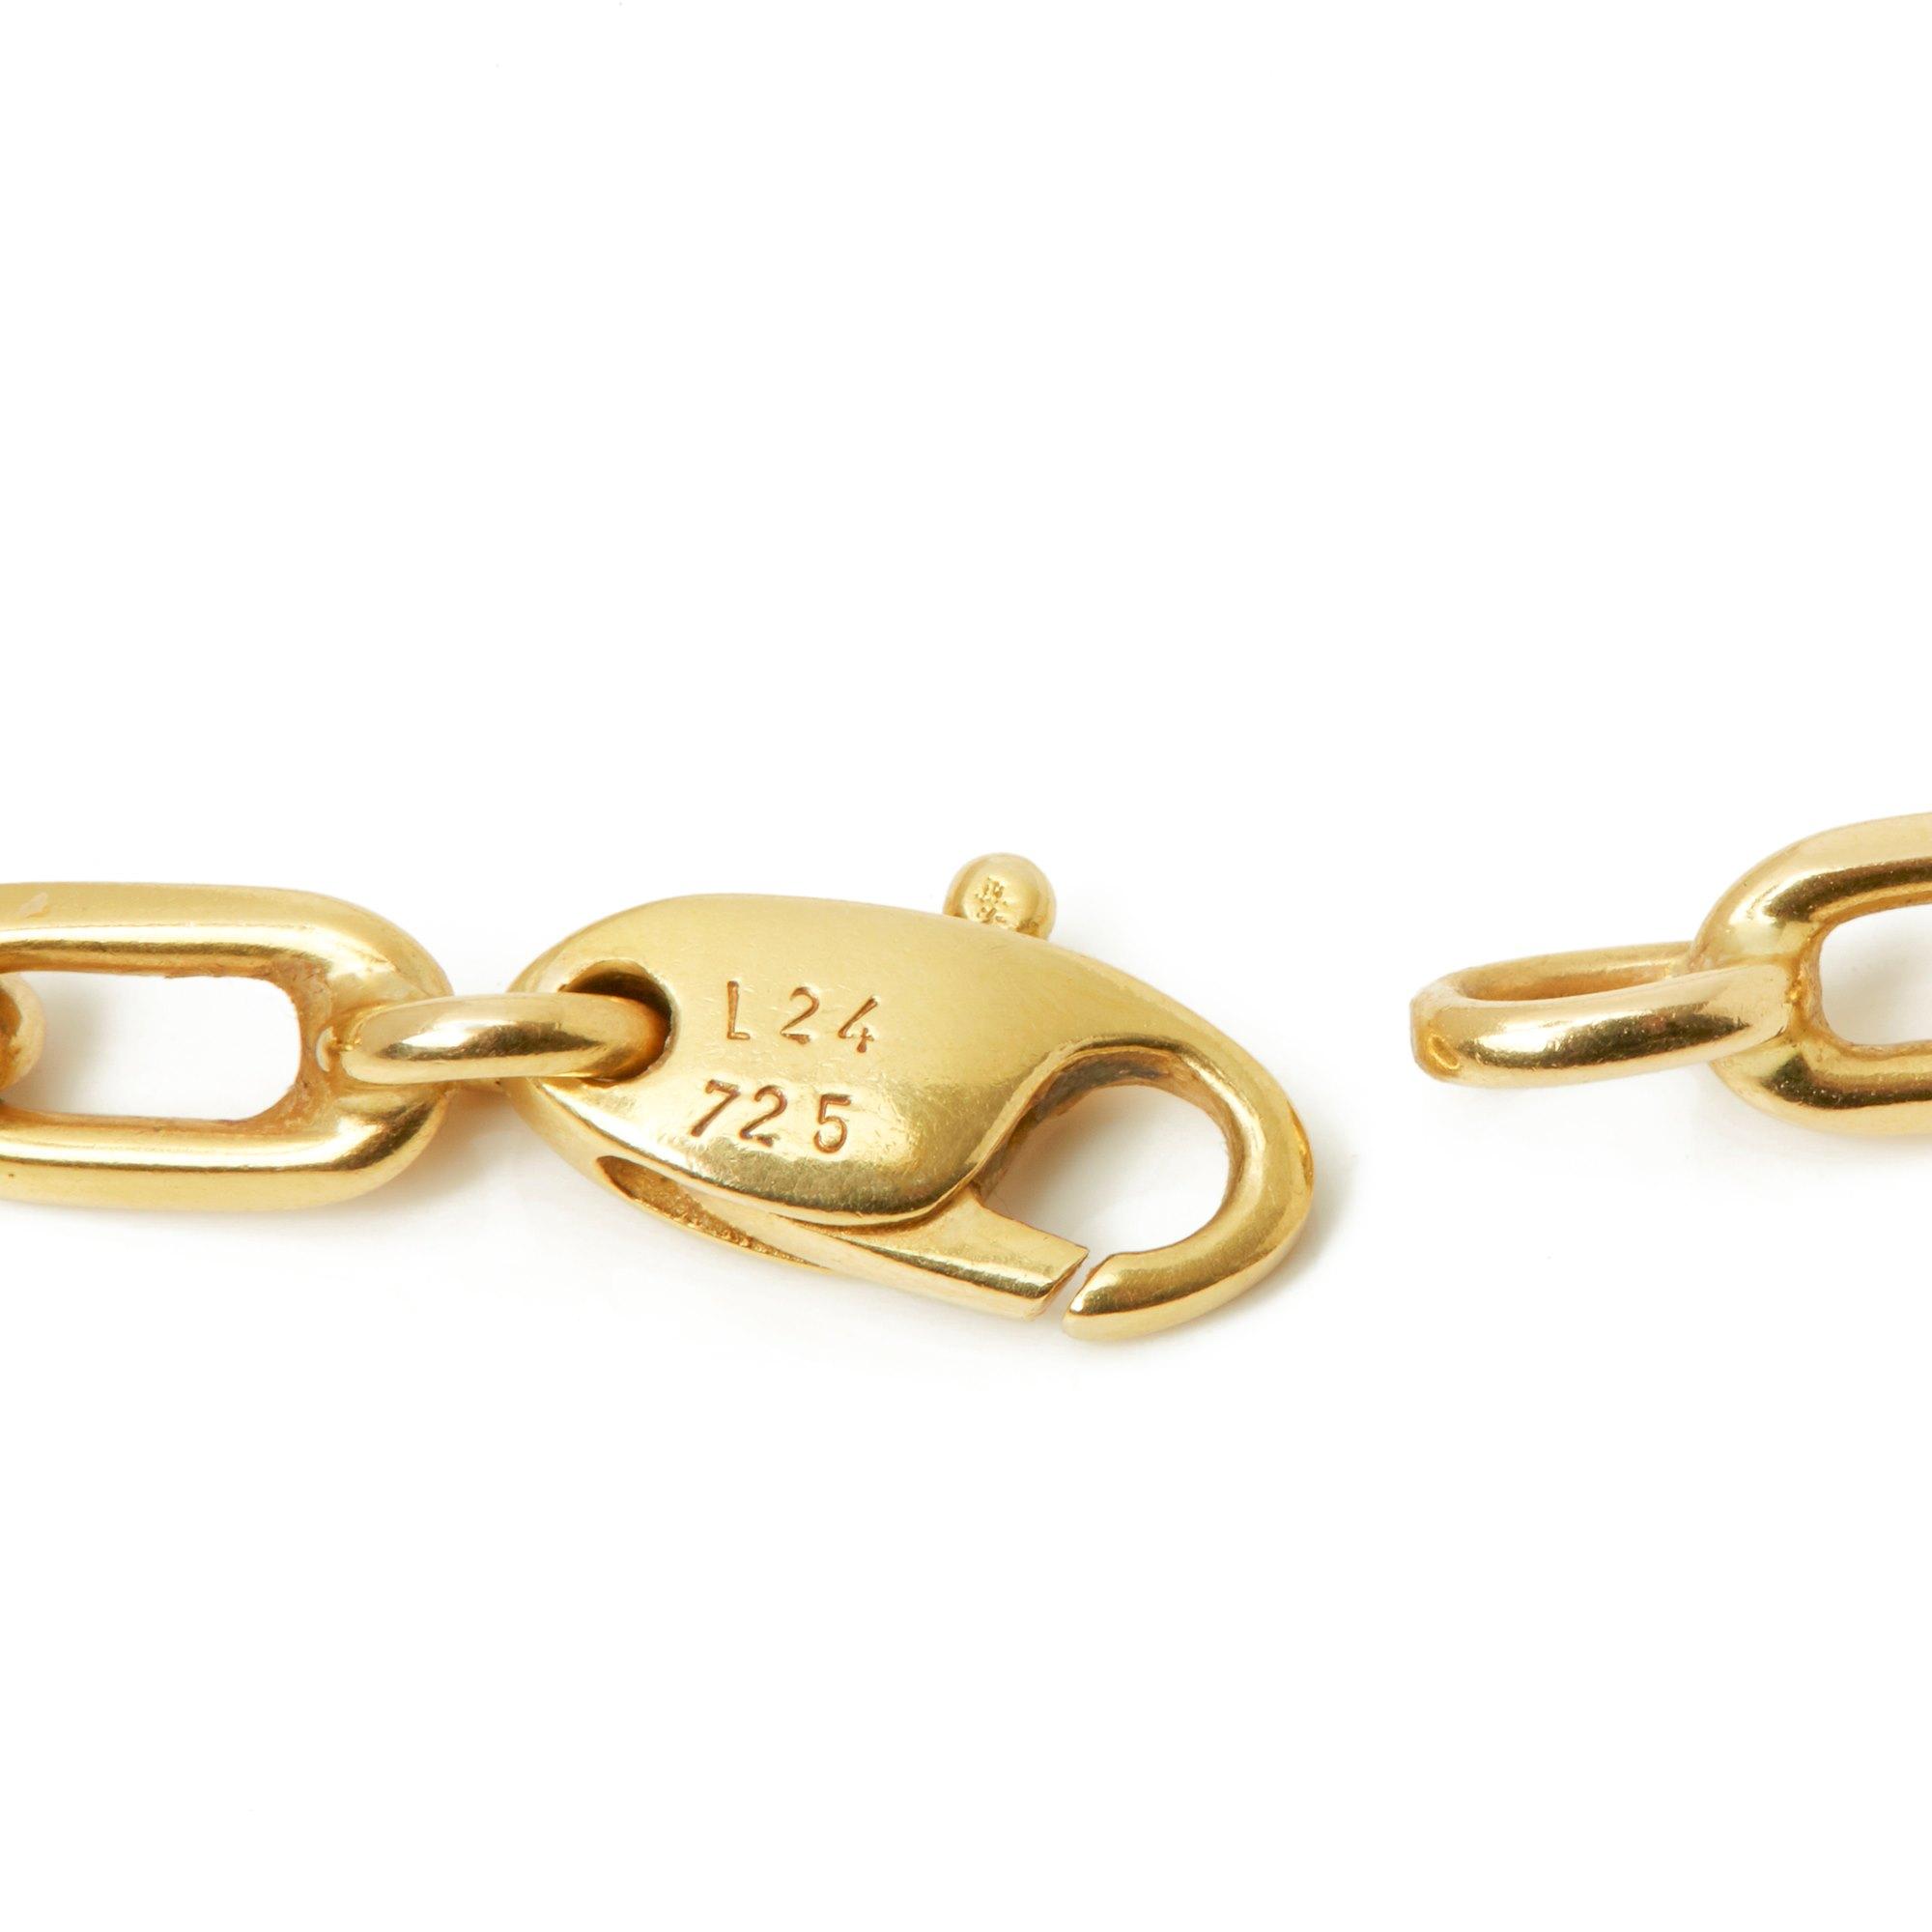 Cartier 18k Yellow Gold Santos de Cartier Spartacus Necklace